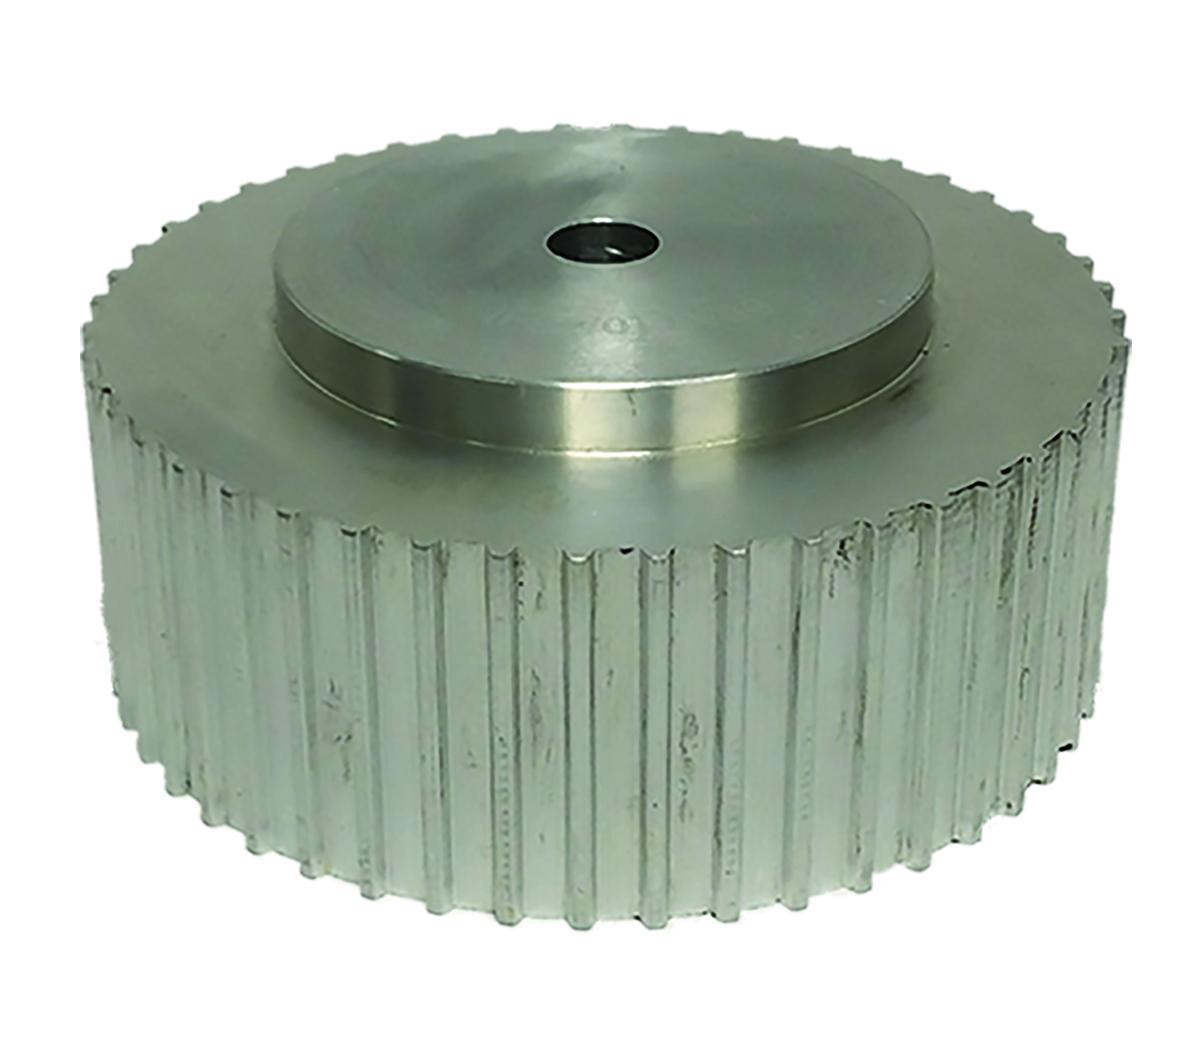 66AT10/48-0 - Aluminum Metric Pulleys